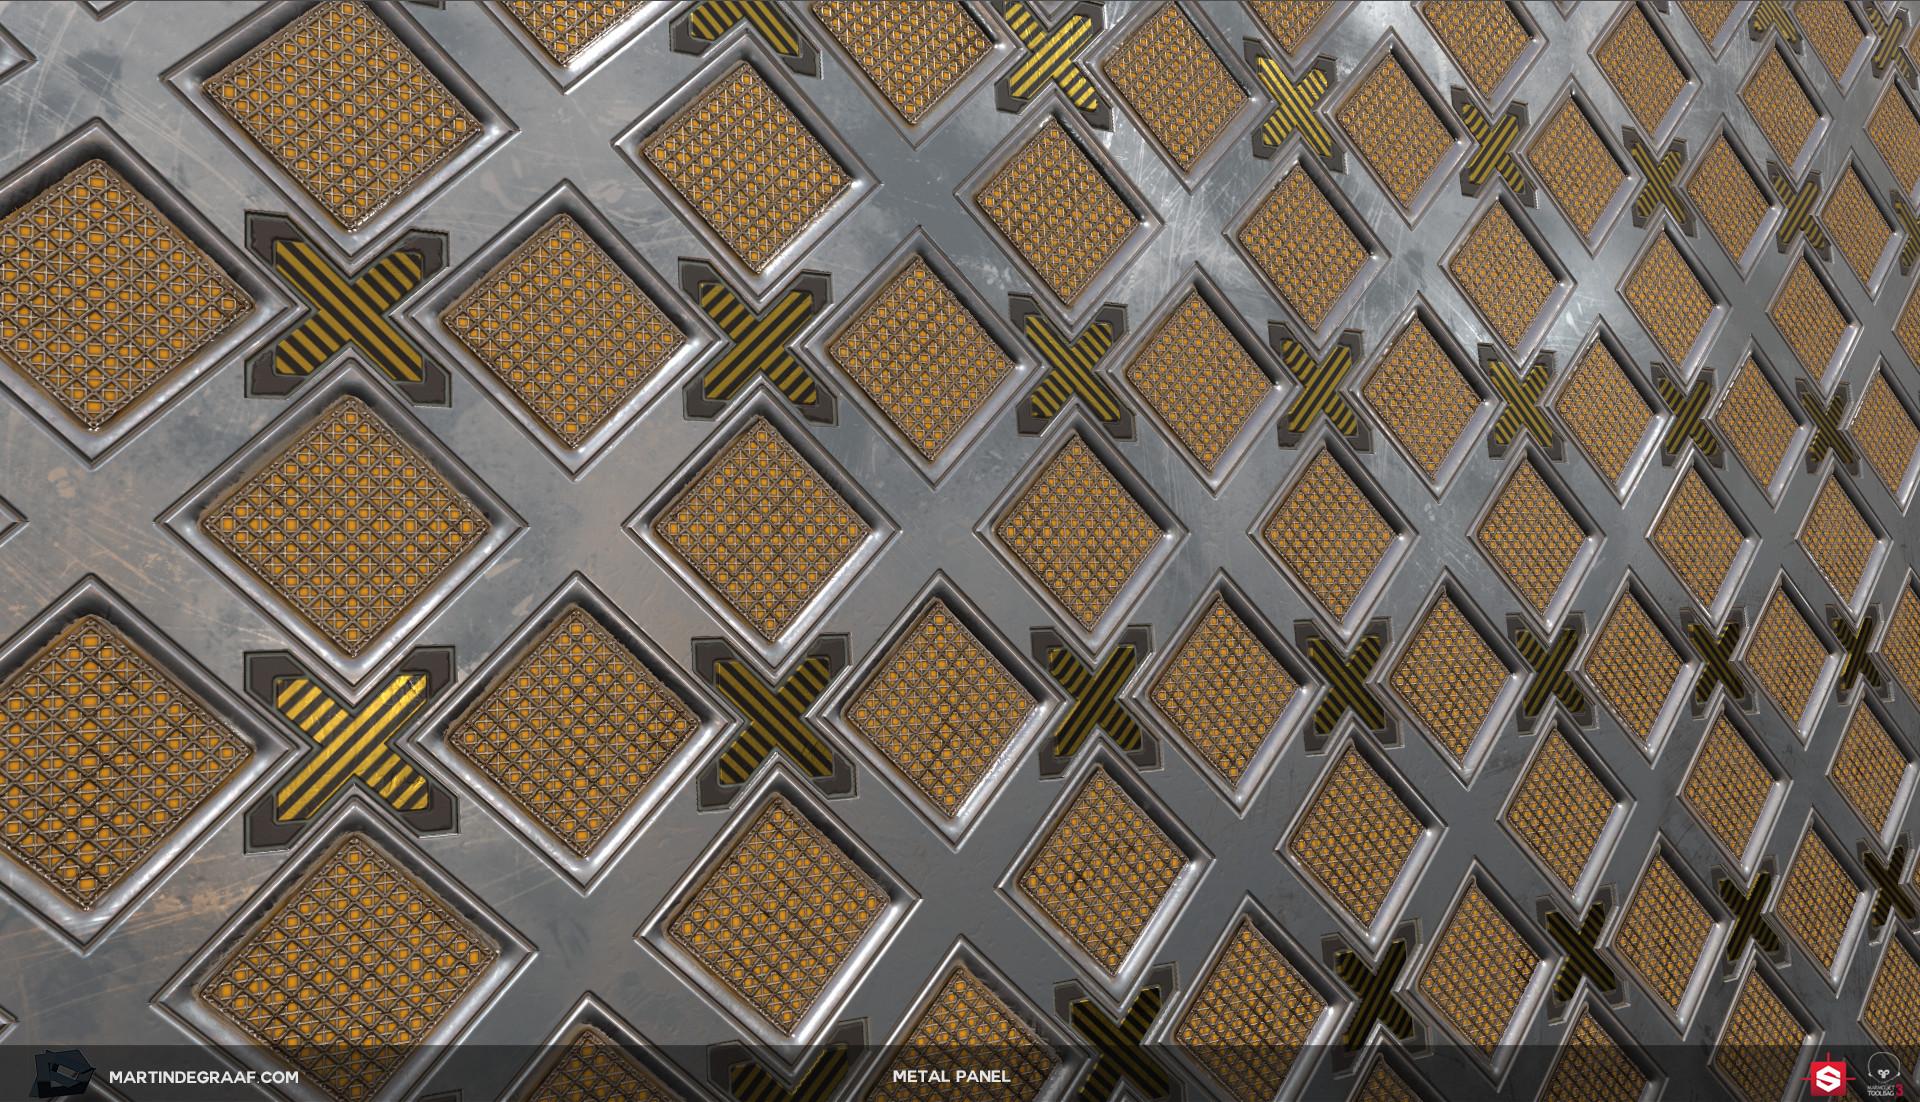 Martin de graaf metal panel substance plane martin de graaf 2017